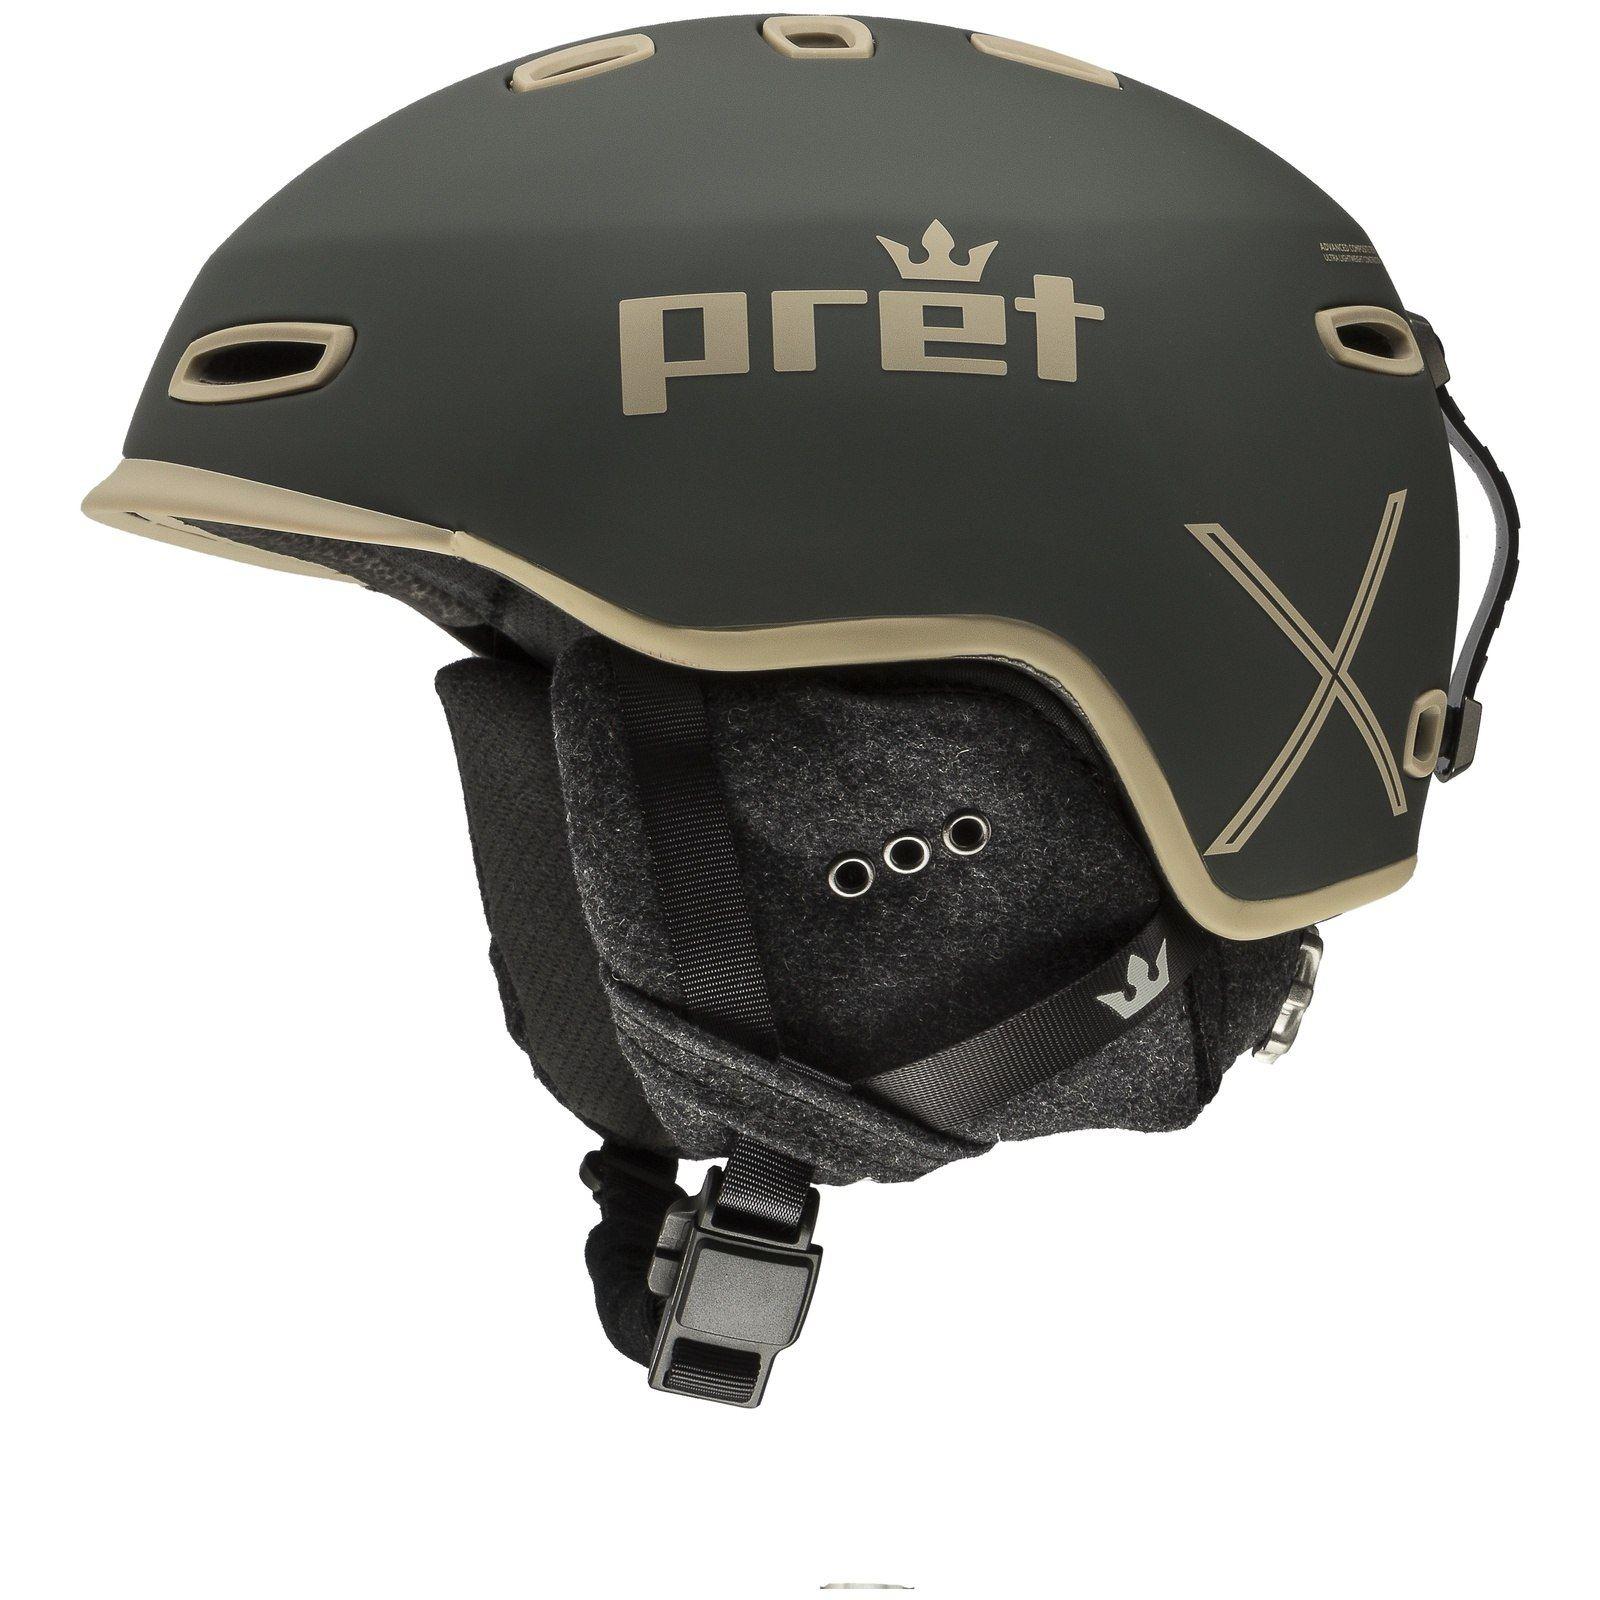 Ski Helmet Sale >> Men S Pret Cynic X Helmet